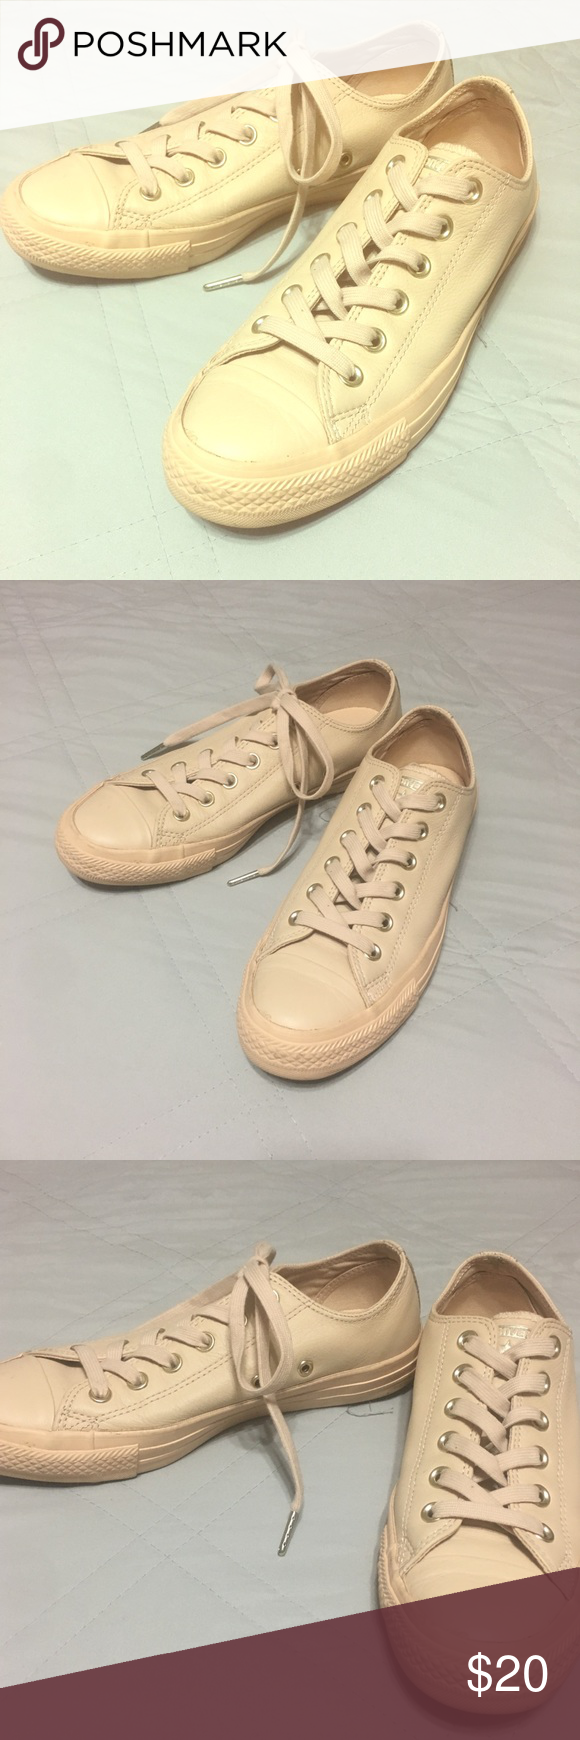 319b05f8b07f31 ⭐️Cream colored converse shoes⭐ 👌🏼 Brand new